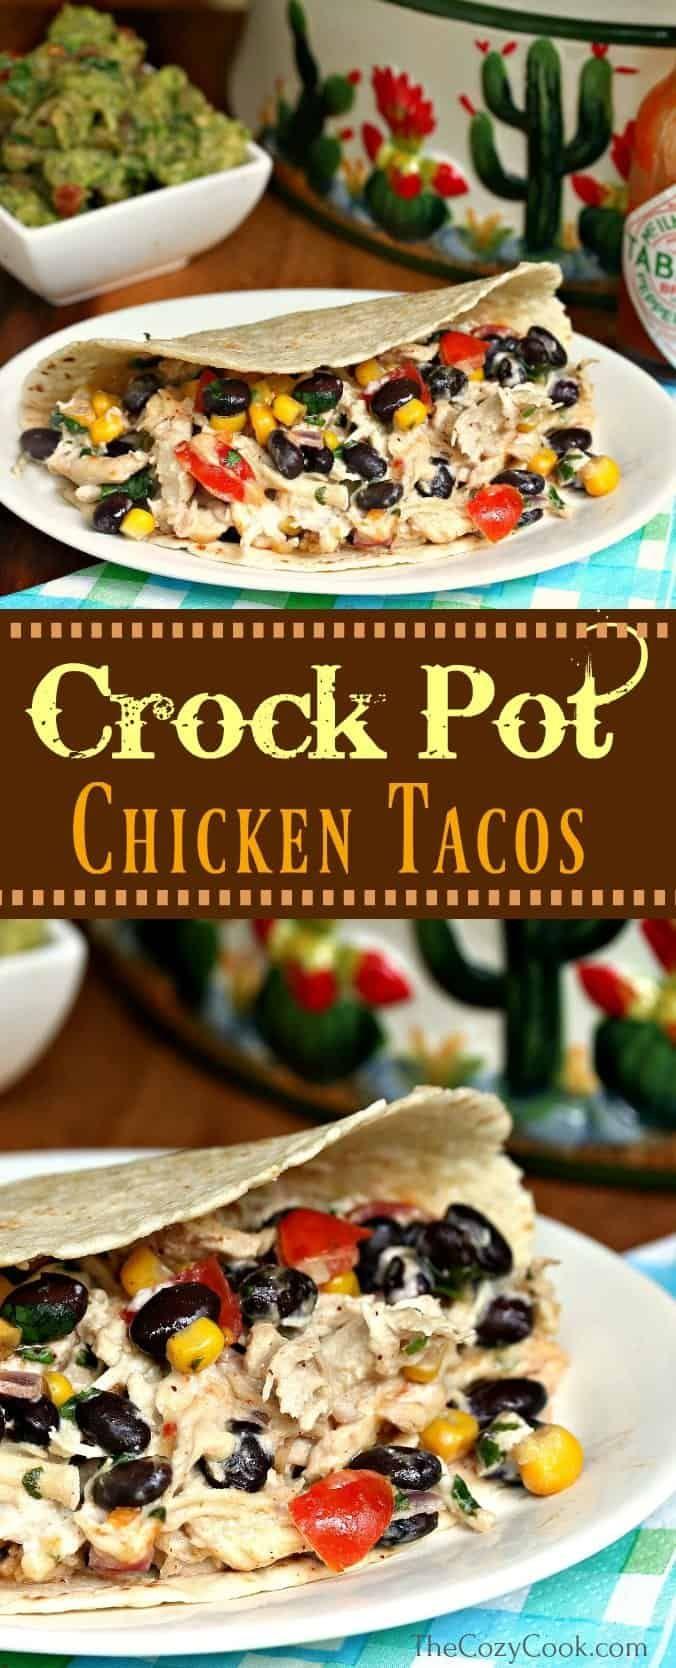 Crock Pot Chicken Tacos - The Cozy Cook